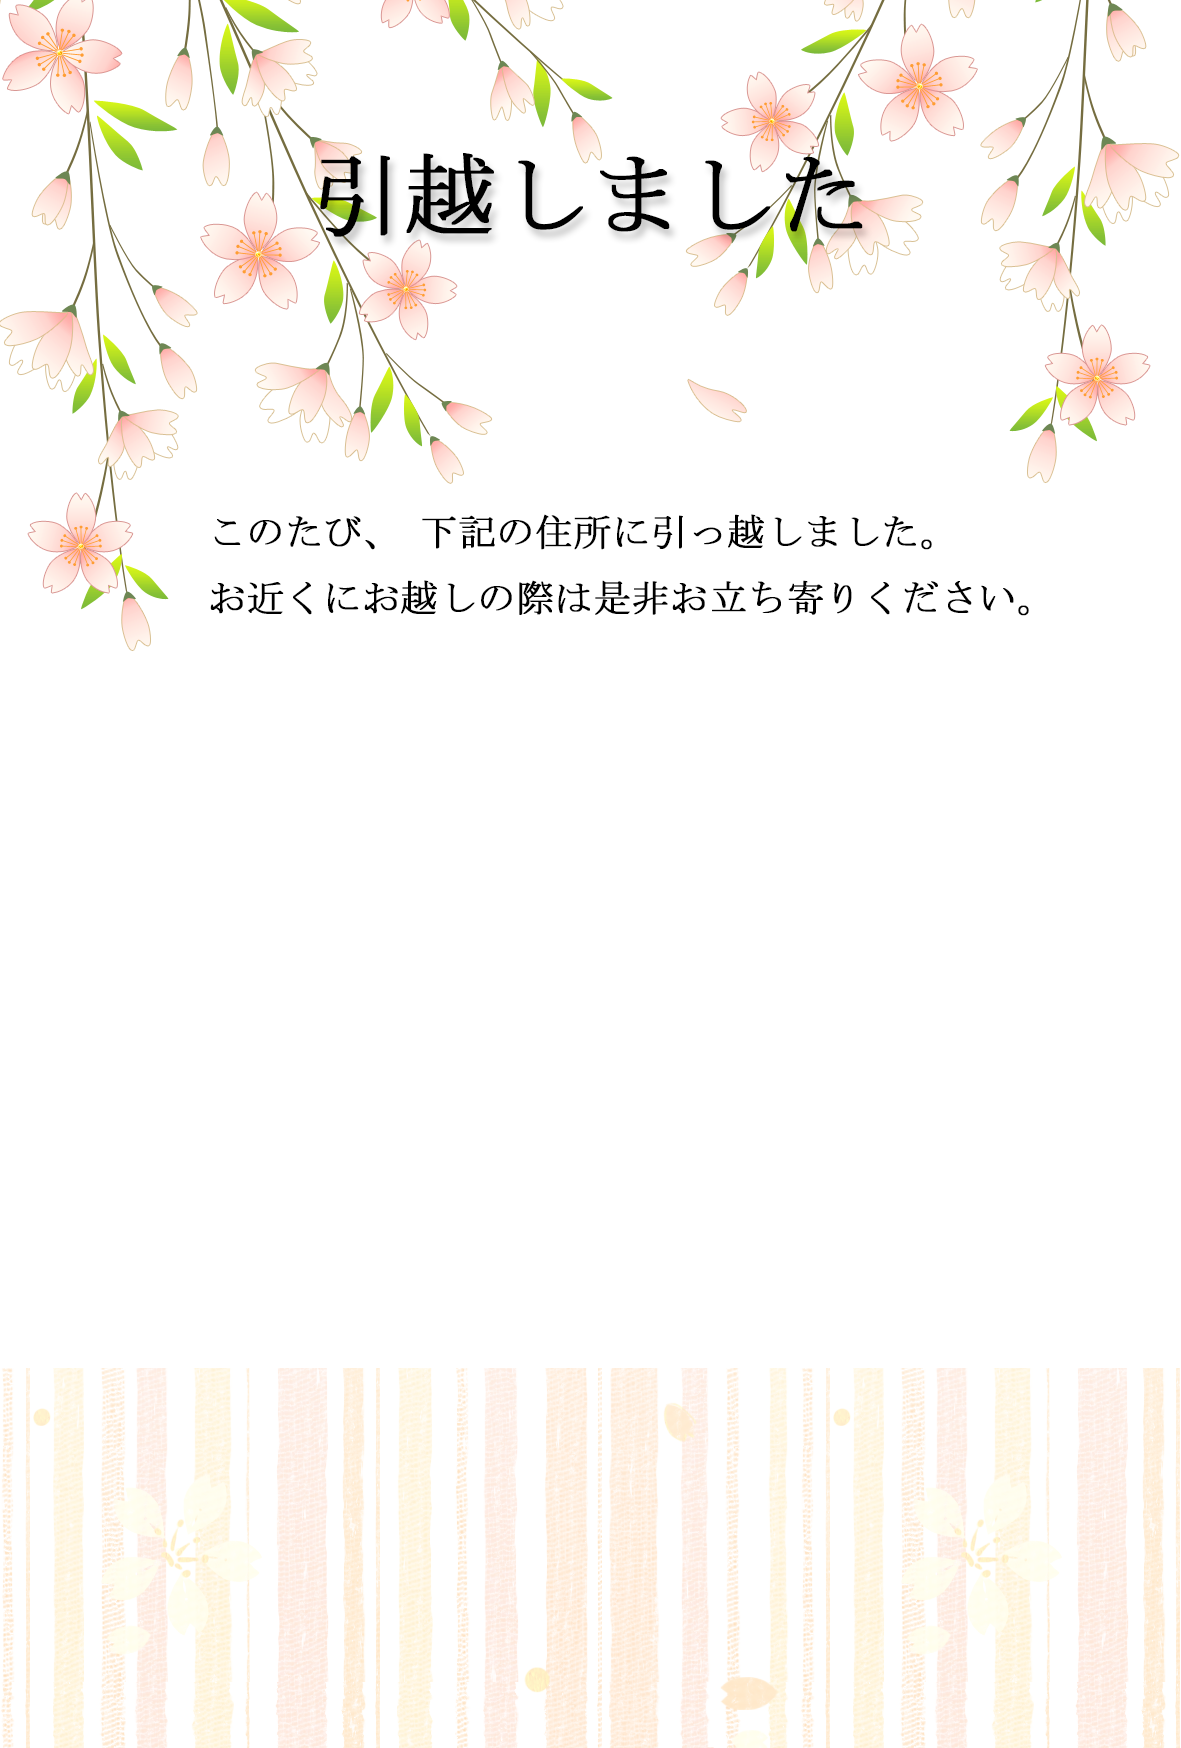 ... Andante | 桜 フォトフレーム : フレーム ワード : すべての講義